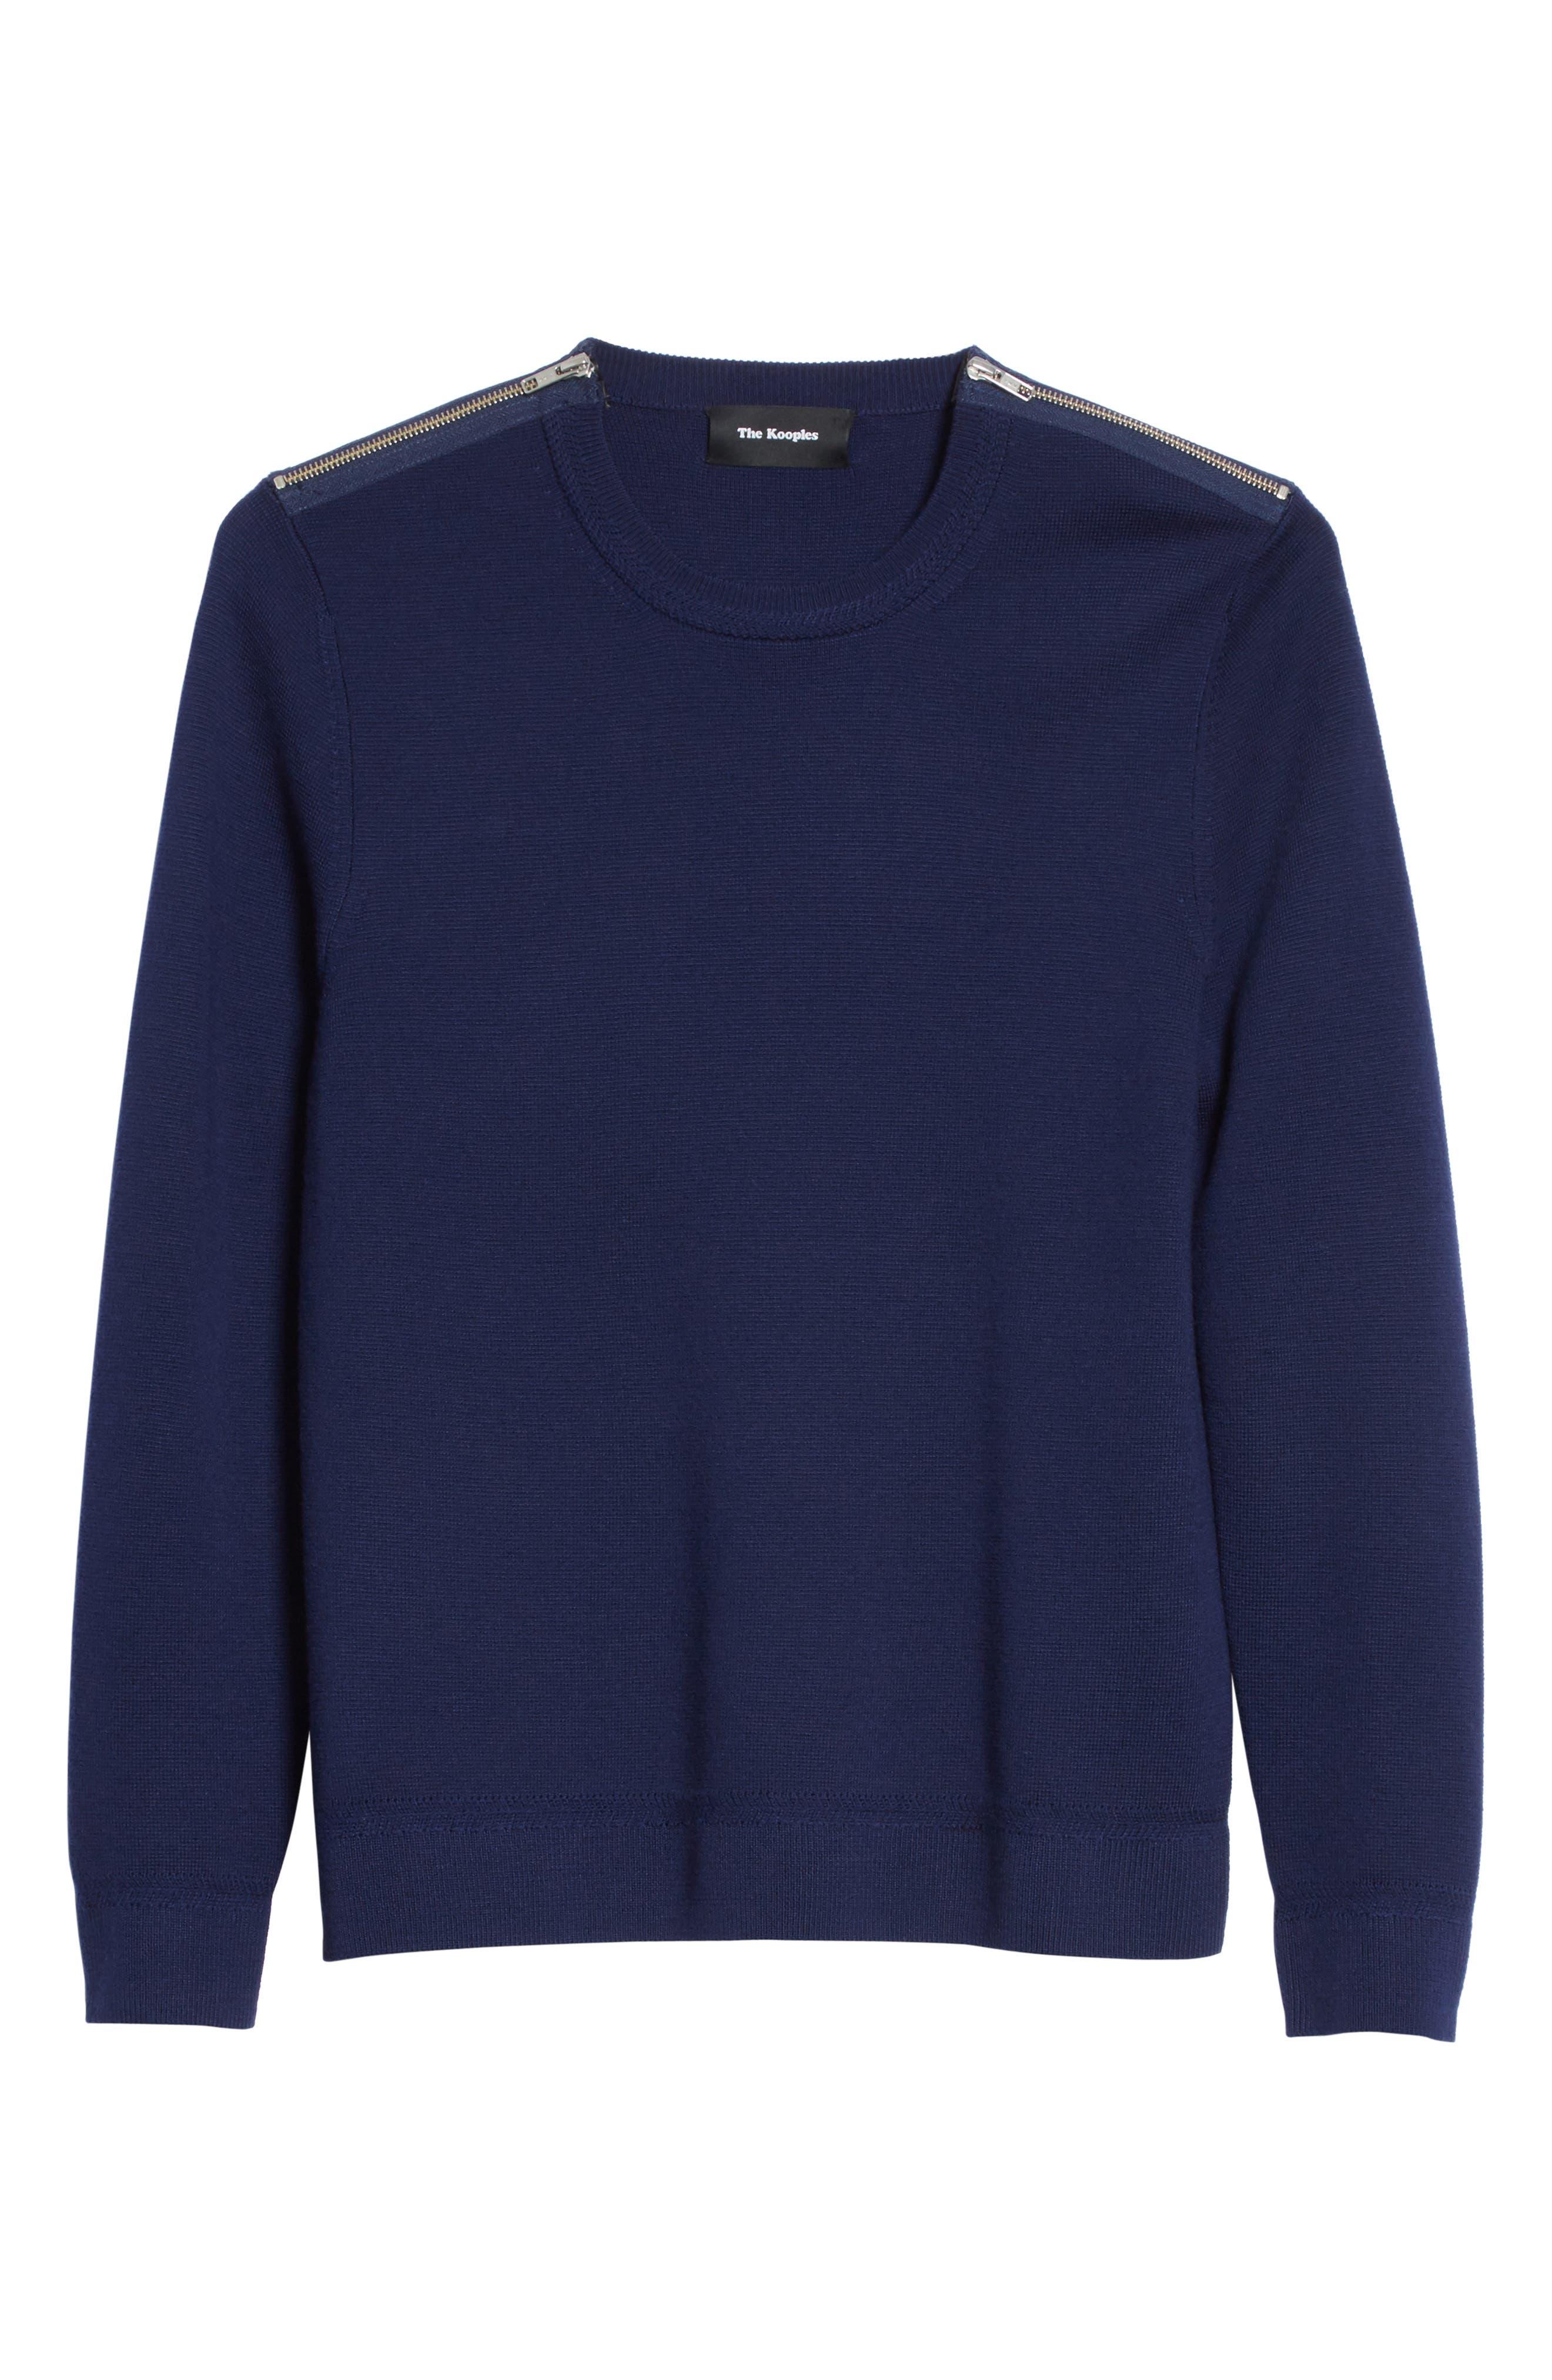 Merino Wool Blend Sweater with Shoulder Zip Trim,                             Alternate thumbnail 6, color,                             Navy